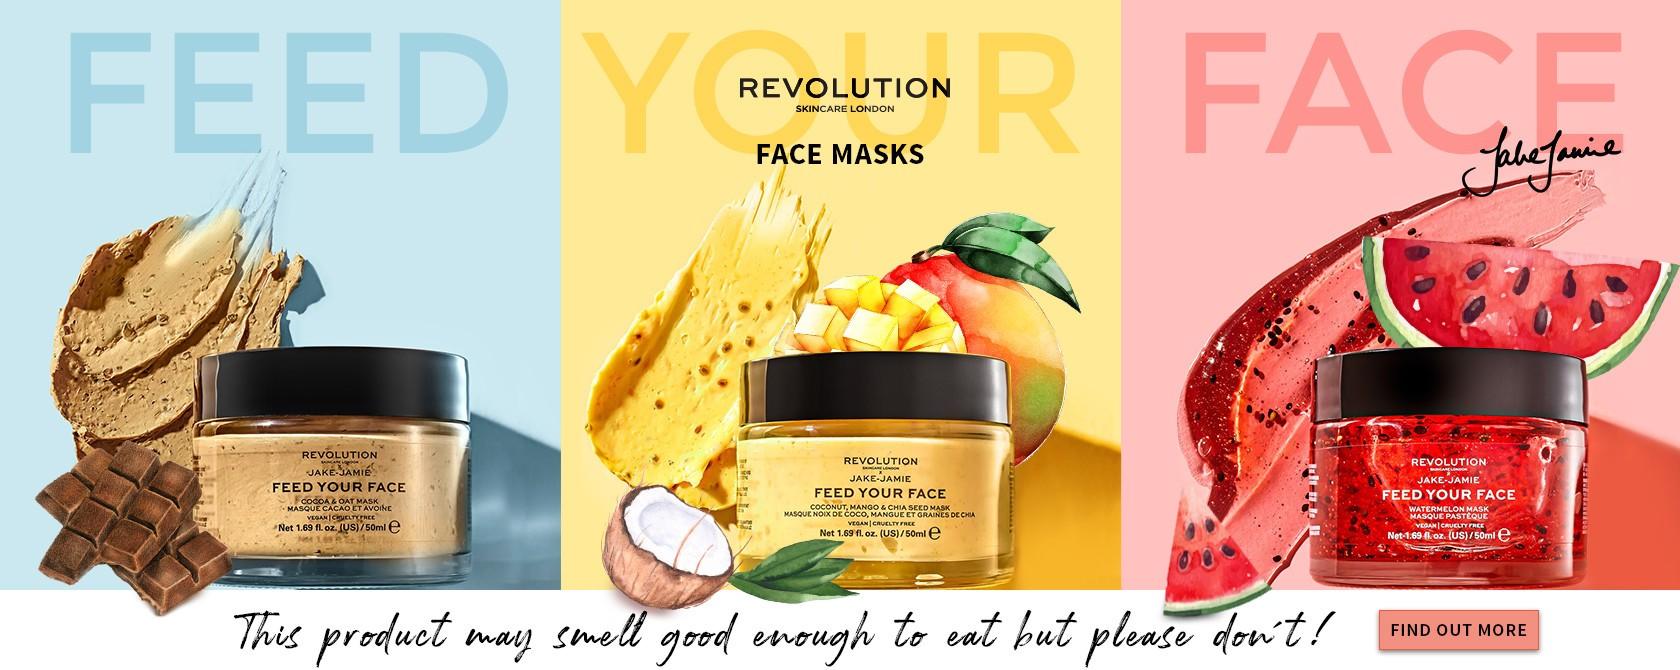 Revolution Skincare Jake Jamie FACE MASKS